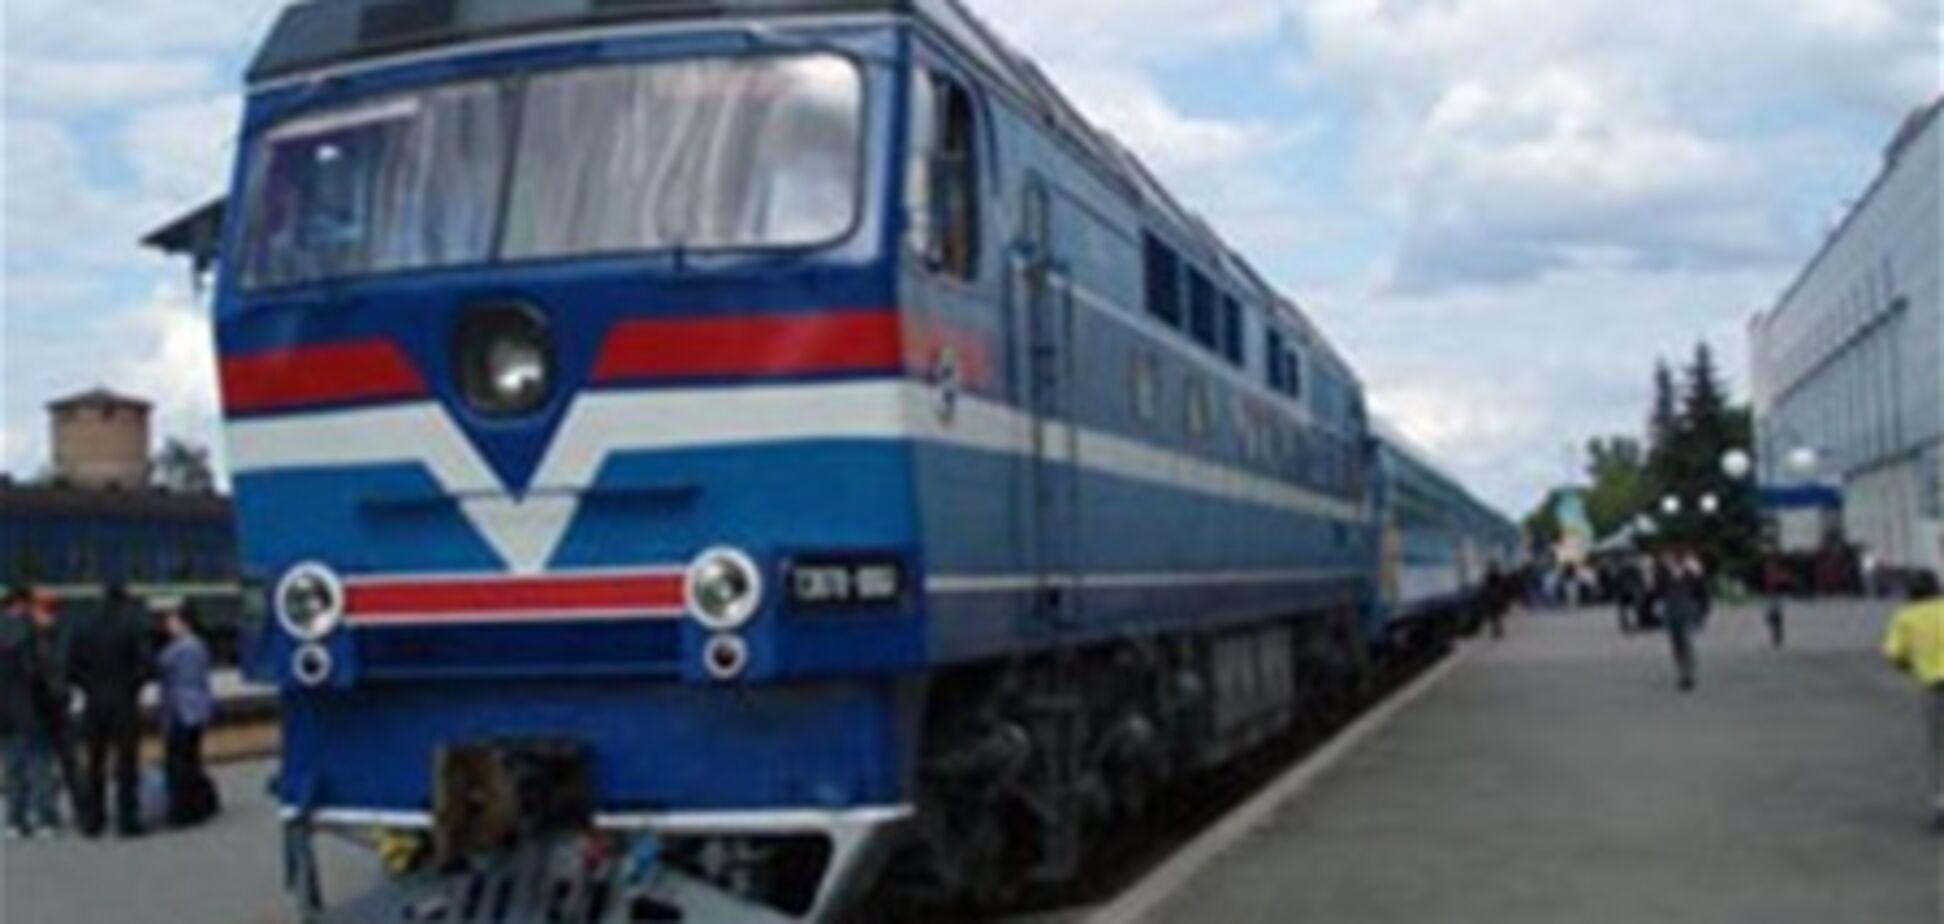 Взрывчатка на вокзале в Днепропетровске не найдена